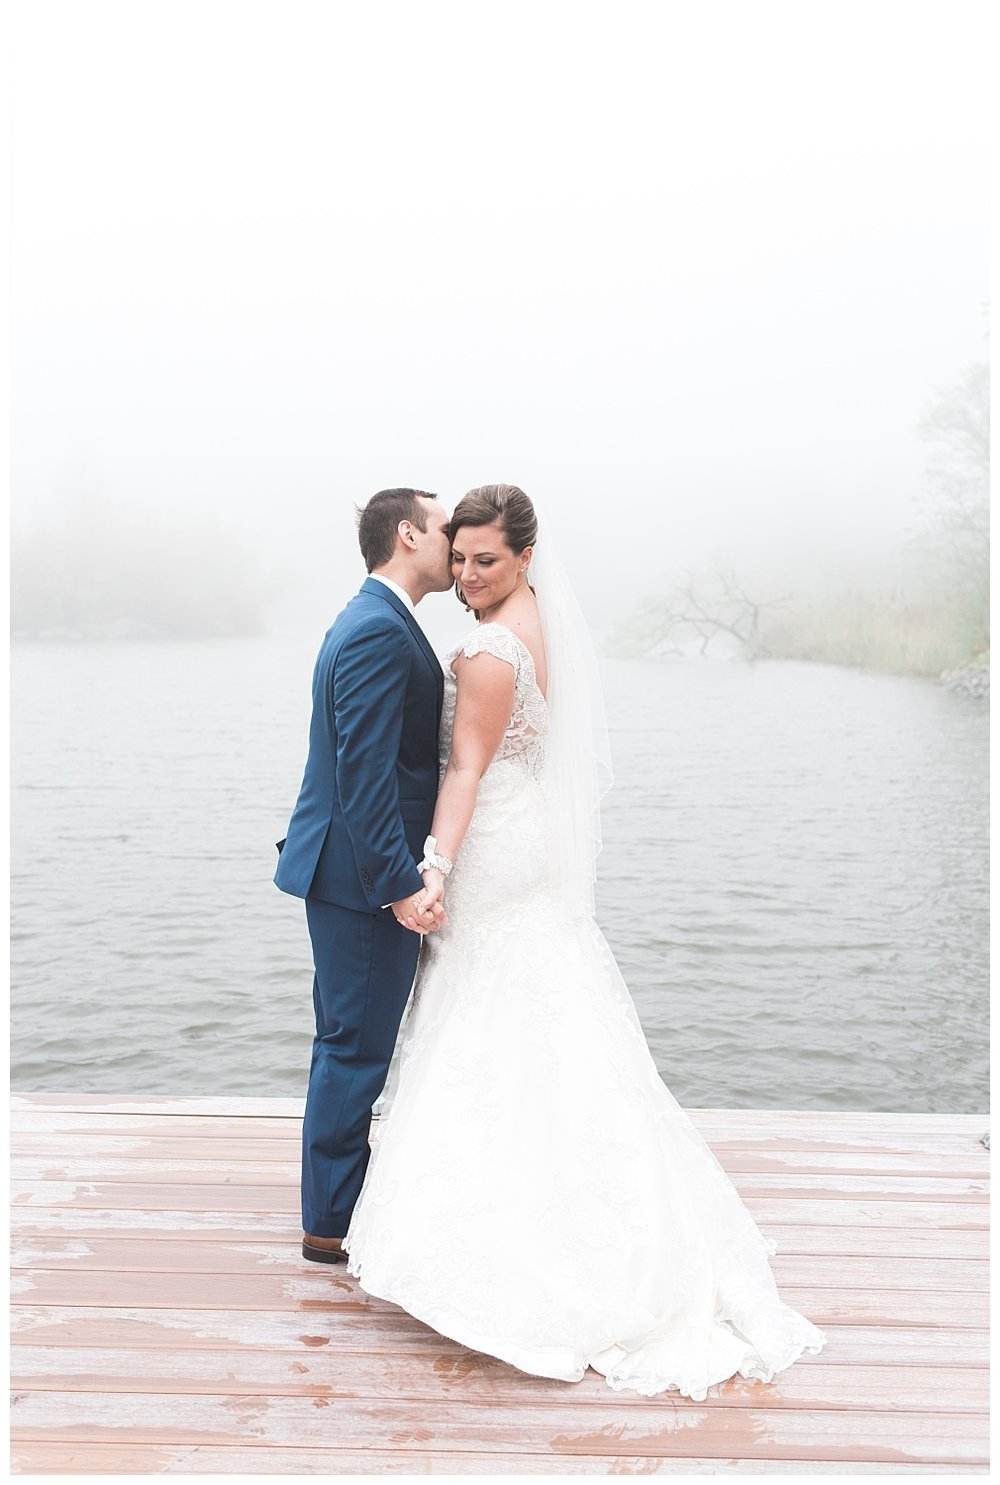 NJ-Wedding-Rock-Island-Lake-Club-Sparta-Navy-Blush-Photographer-Photo-046.JPG